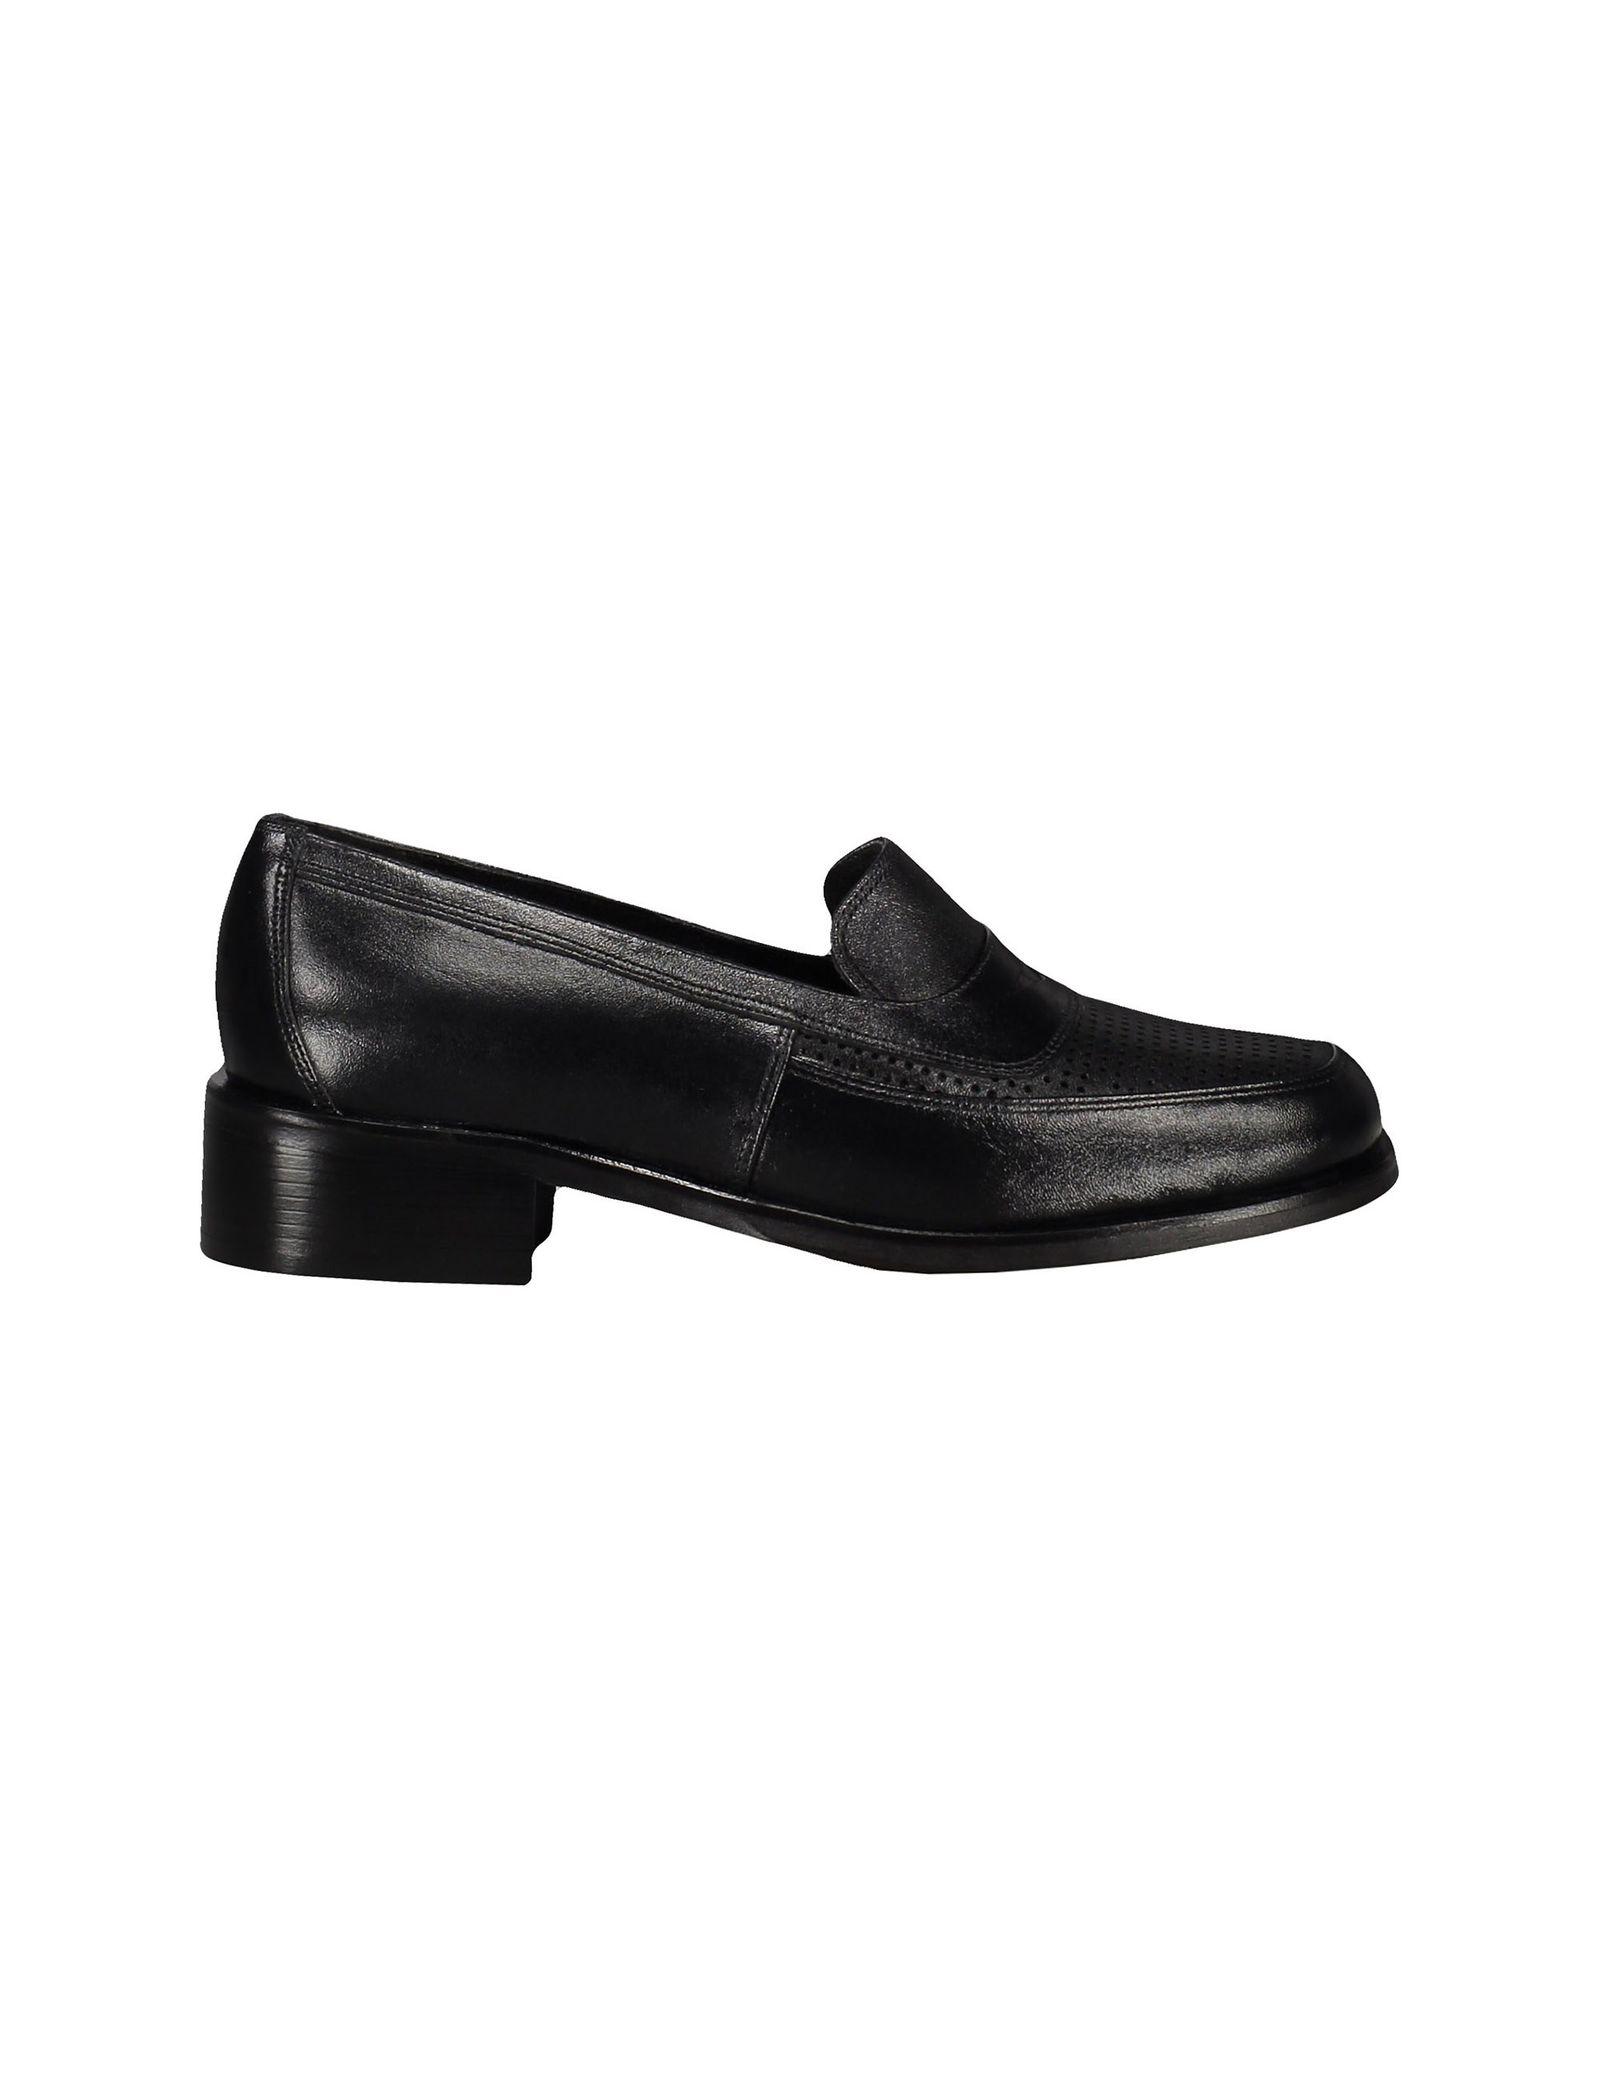 کفش چرم تخت زنانه - شهر چرم - مشکي - 1